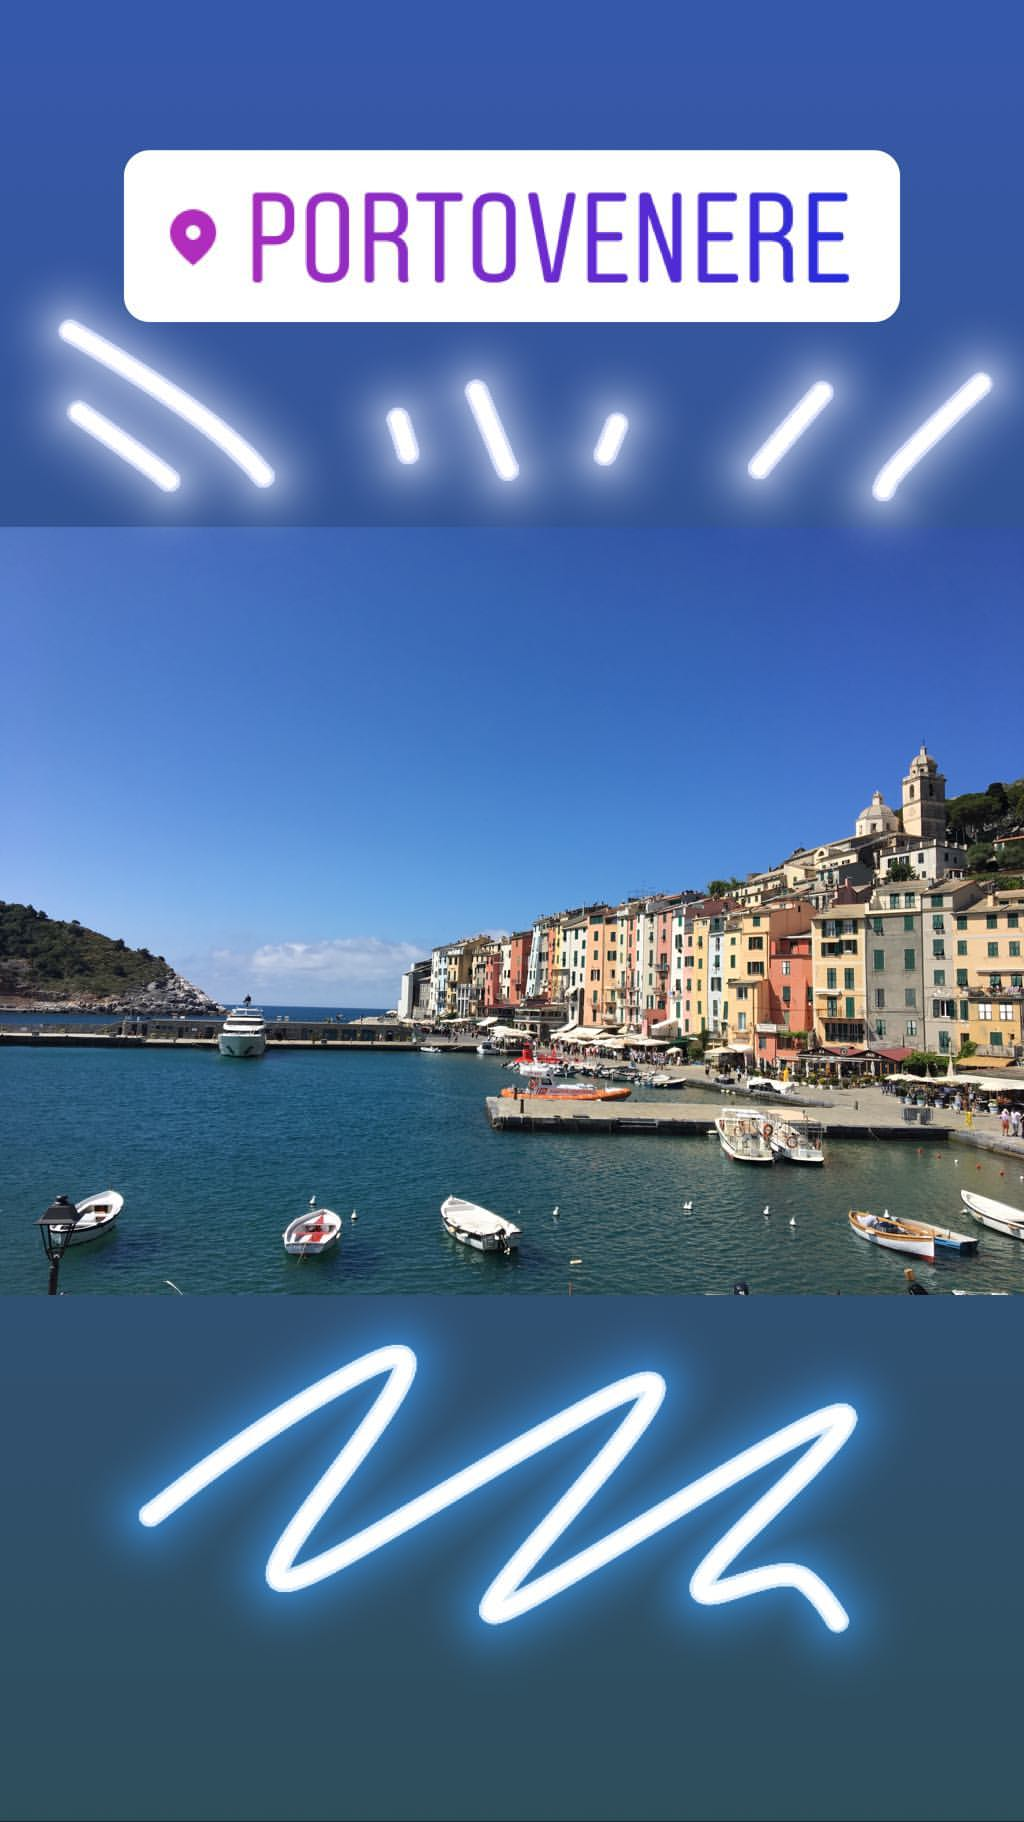 Italia - Porto Venere